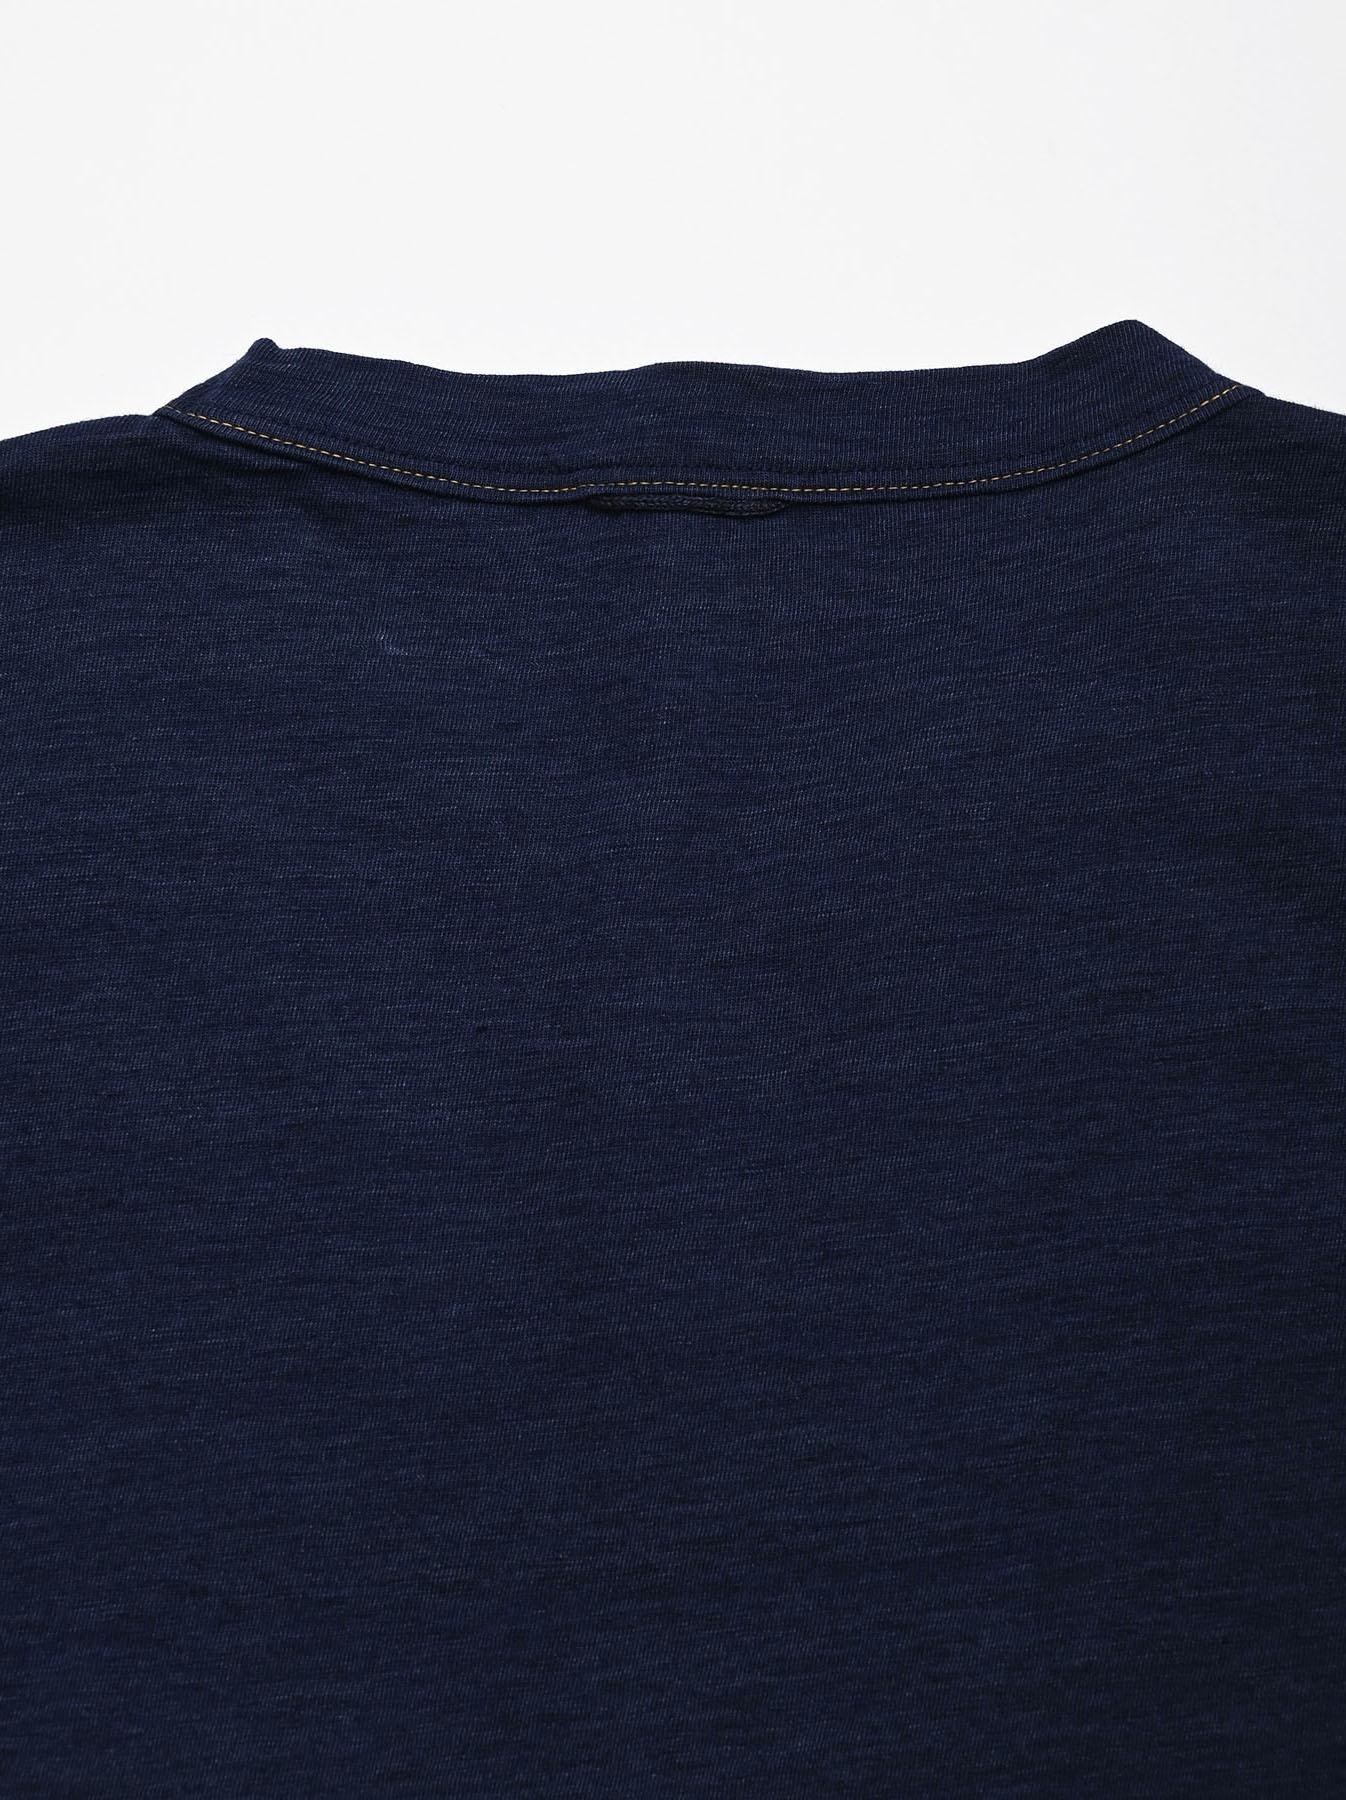 One Wash Indigo Tenjiku 908 Ocean T-Shirt (0621)-9